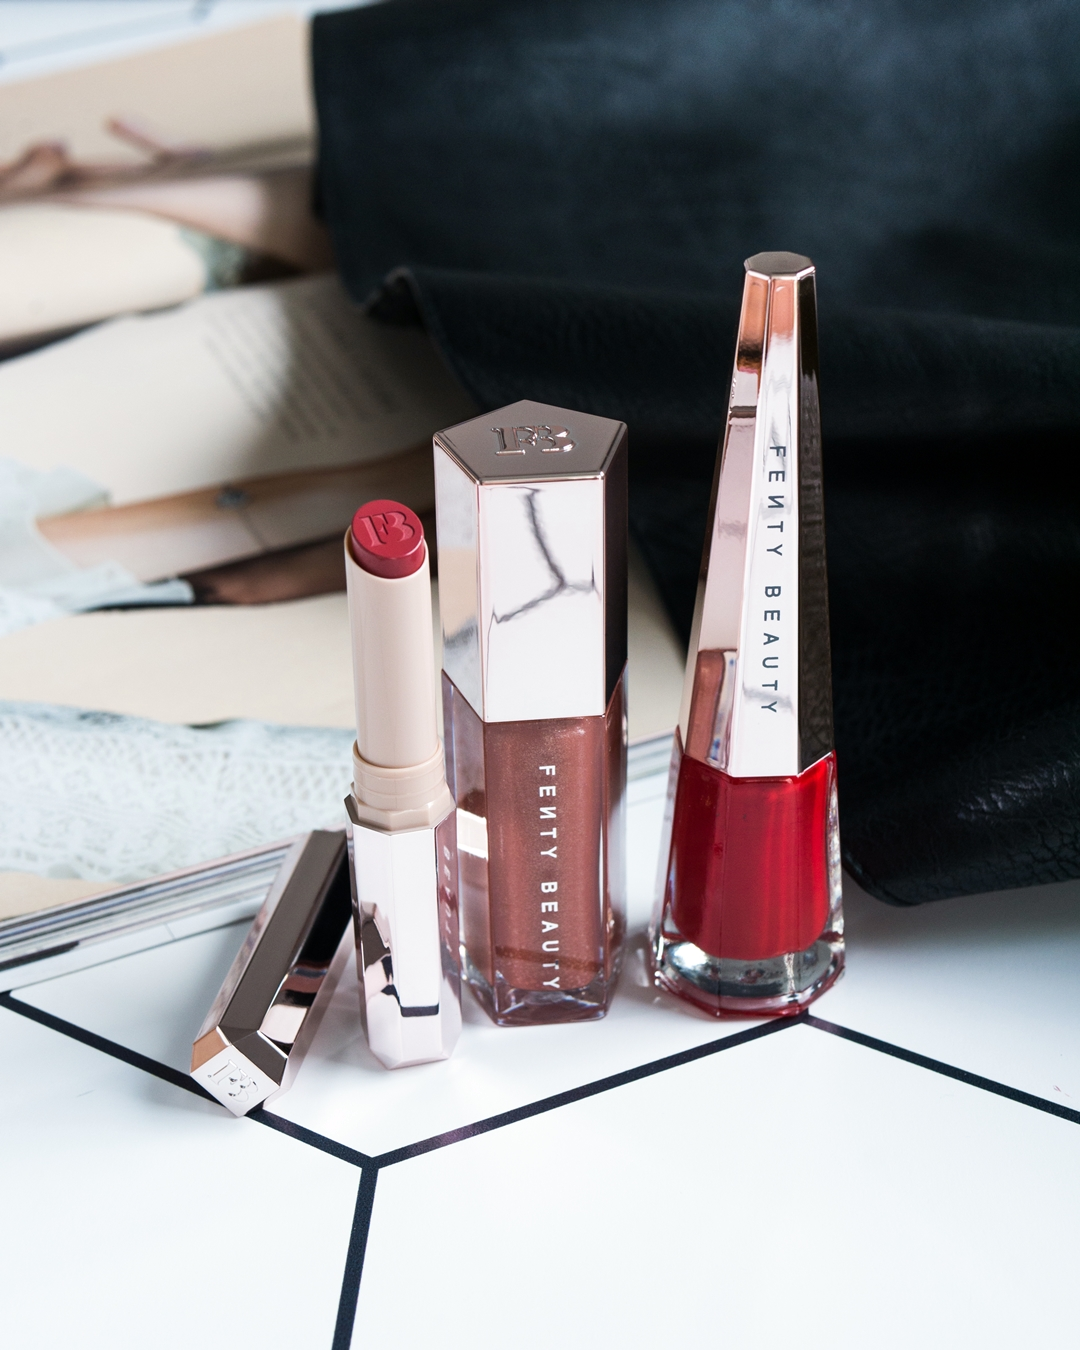 Fenty Beauty Gloss Bomb Universal Lip Luminizer w odcieniu Fenty Glow, Mattemoiselle Plush Matte Lipstick w odcieniu Spanked, Stunna Lip Paint Longwear Fluid Lip Color w odcieniu Uncensored